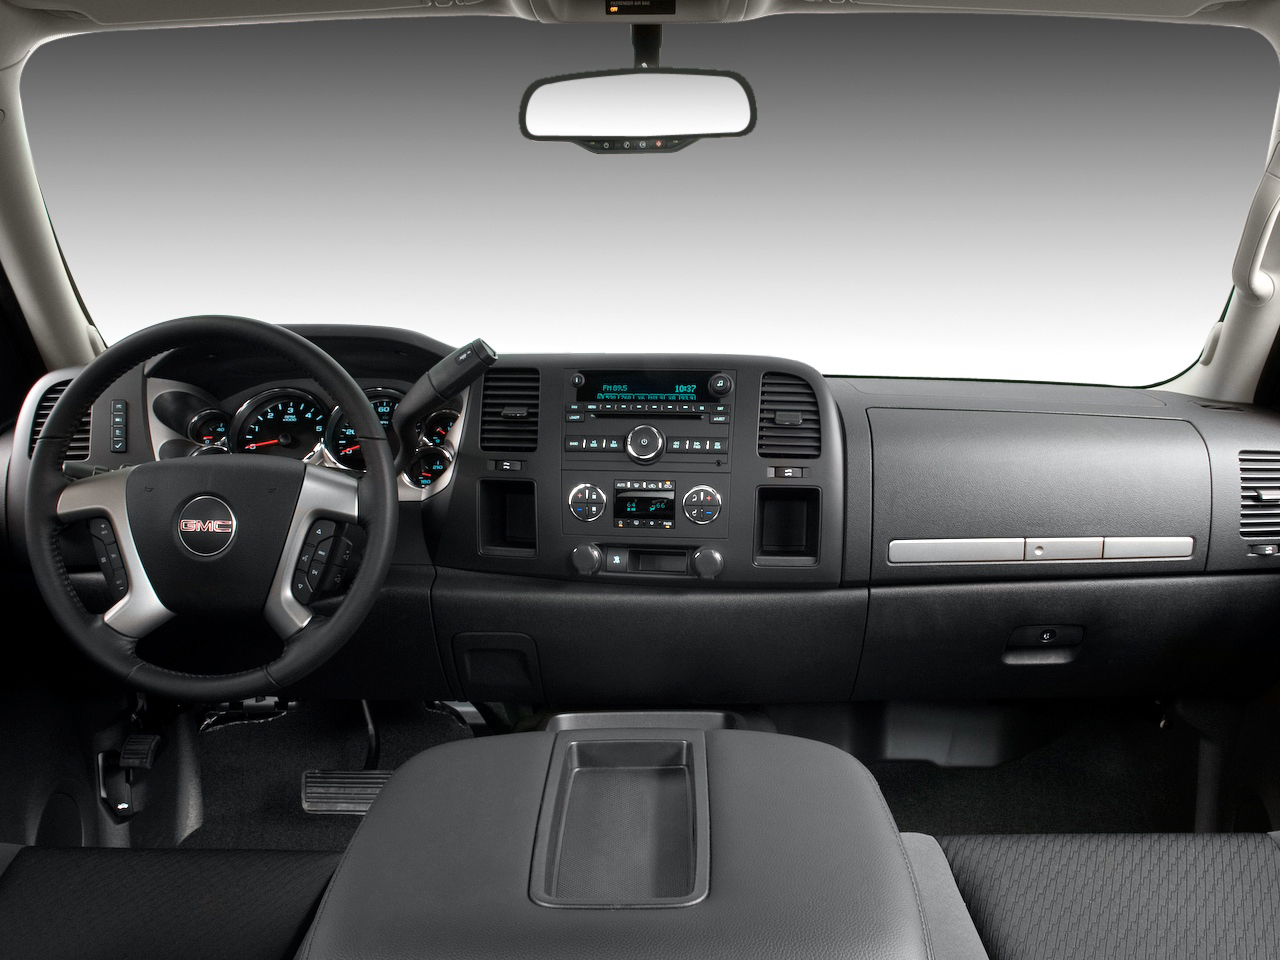 GMC SIERRA 1500 CREW CAB